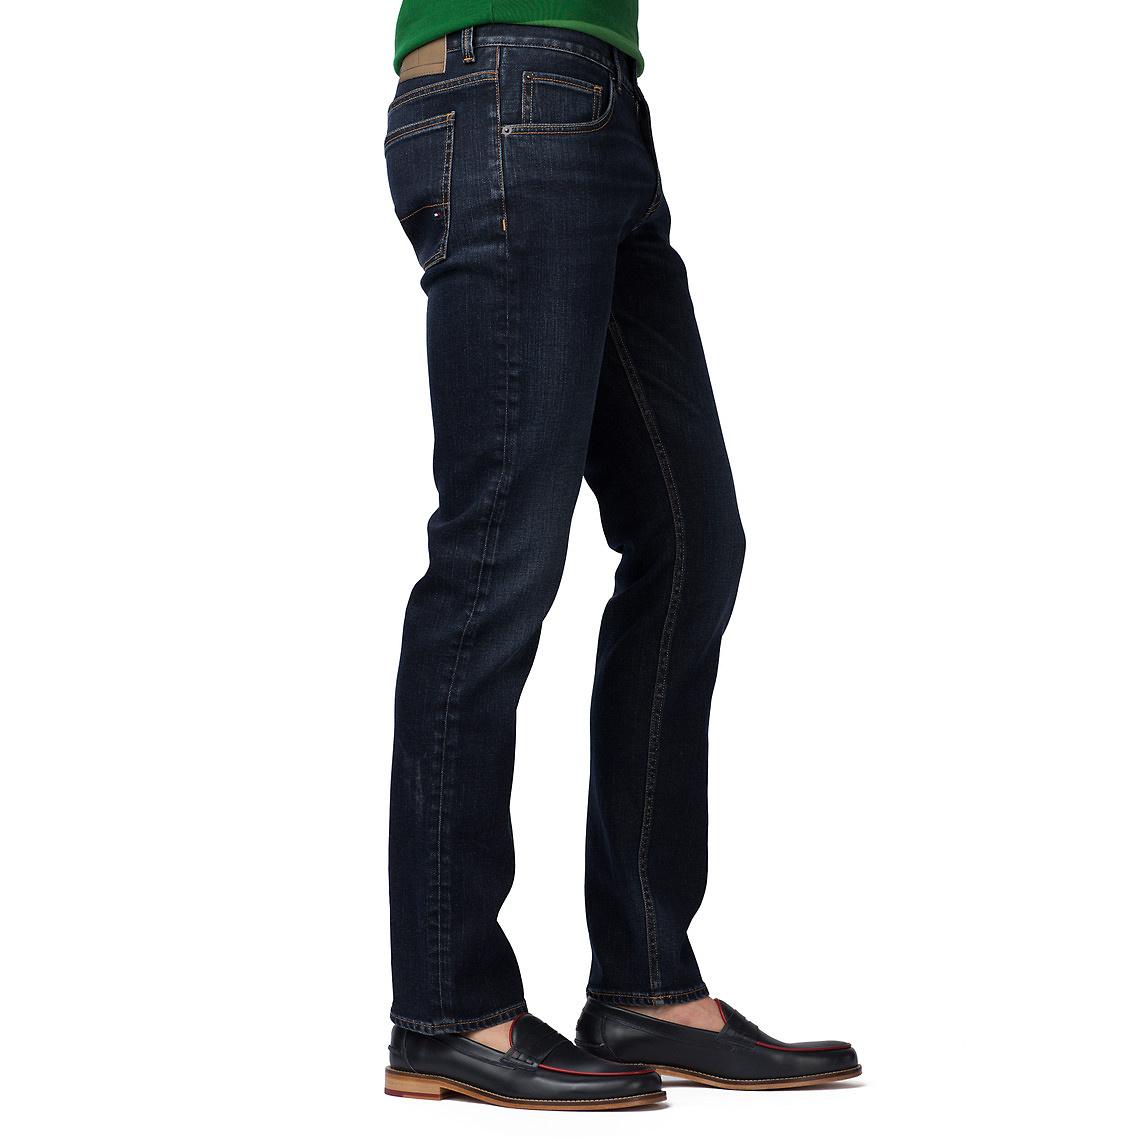 24f4b4245 Tommy Hilfiger Bleecker Slim Fit Jeans in Blue for Men - Lyst